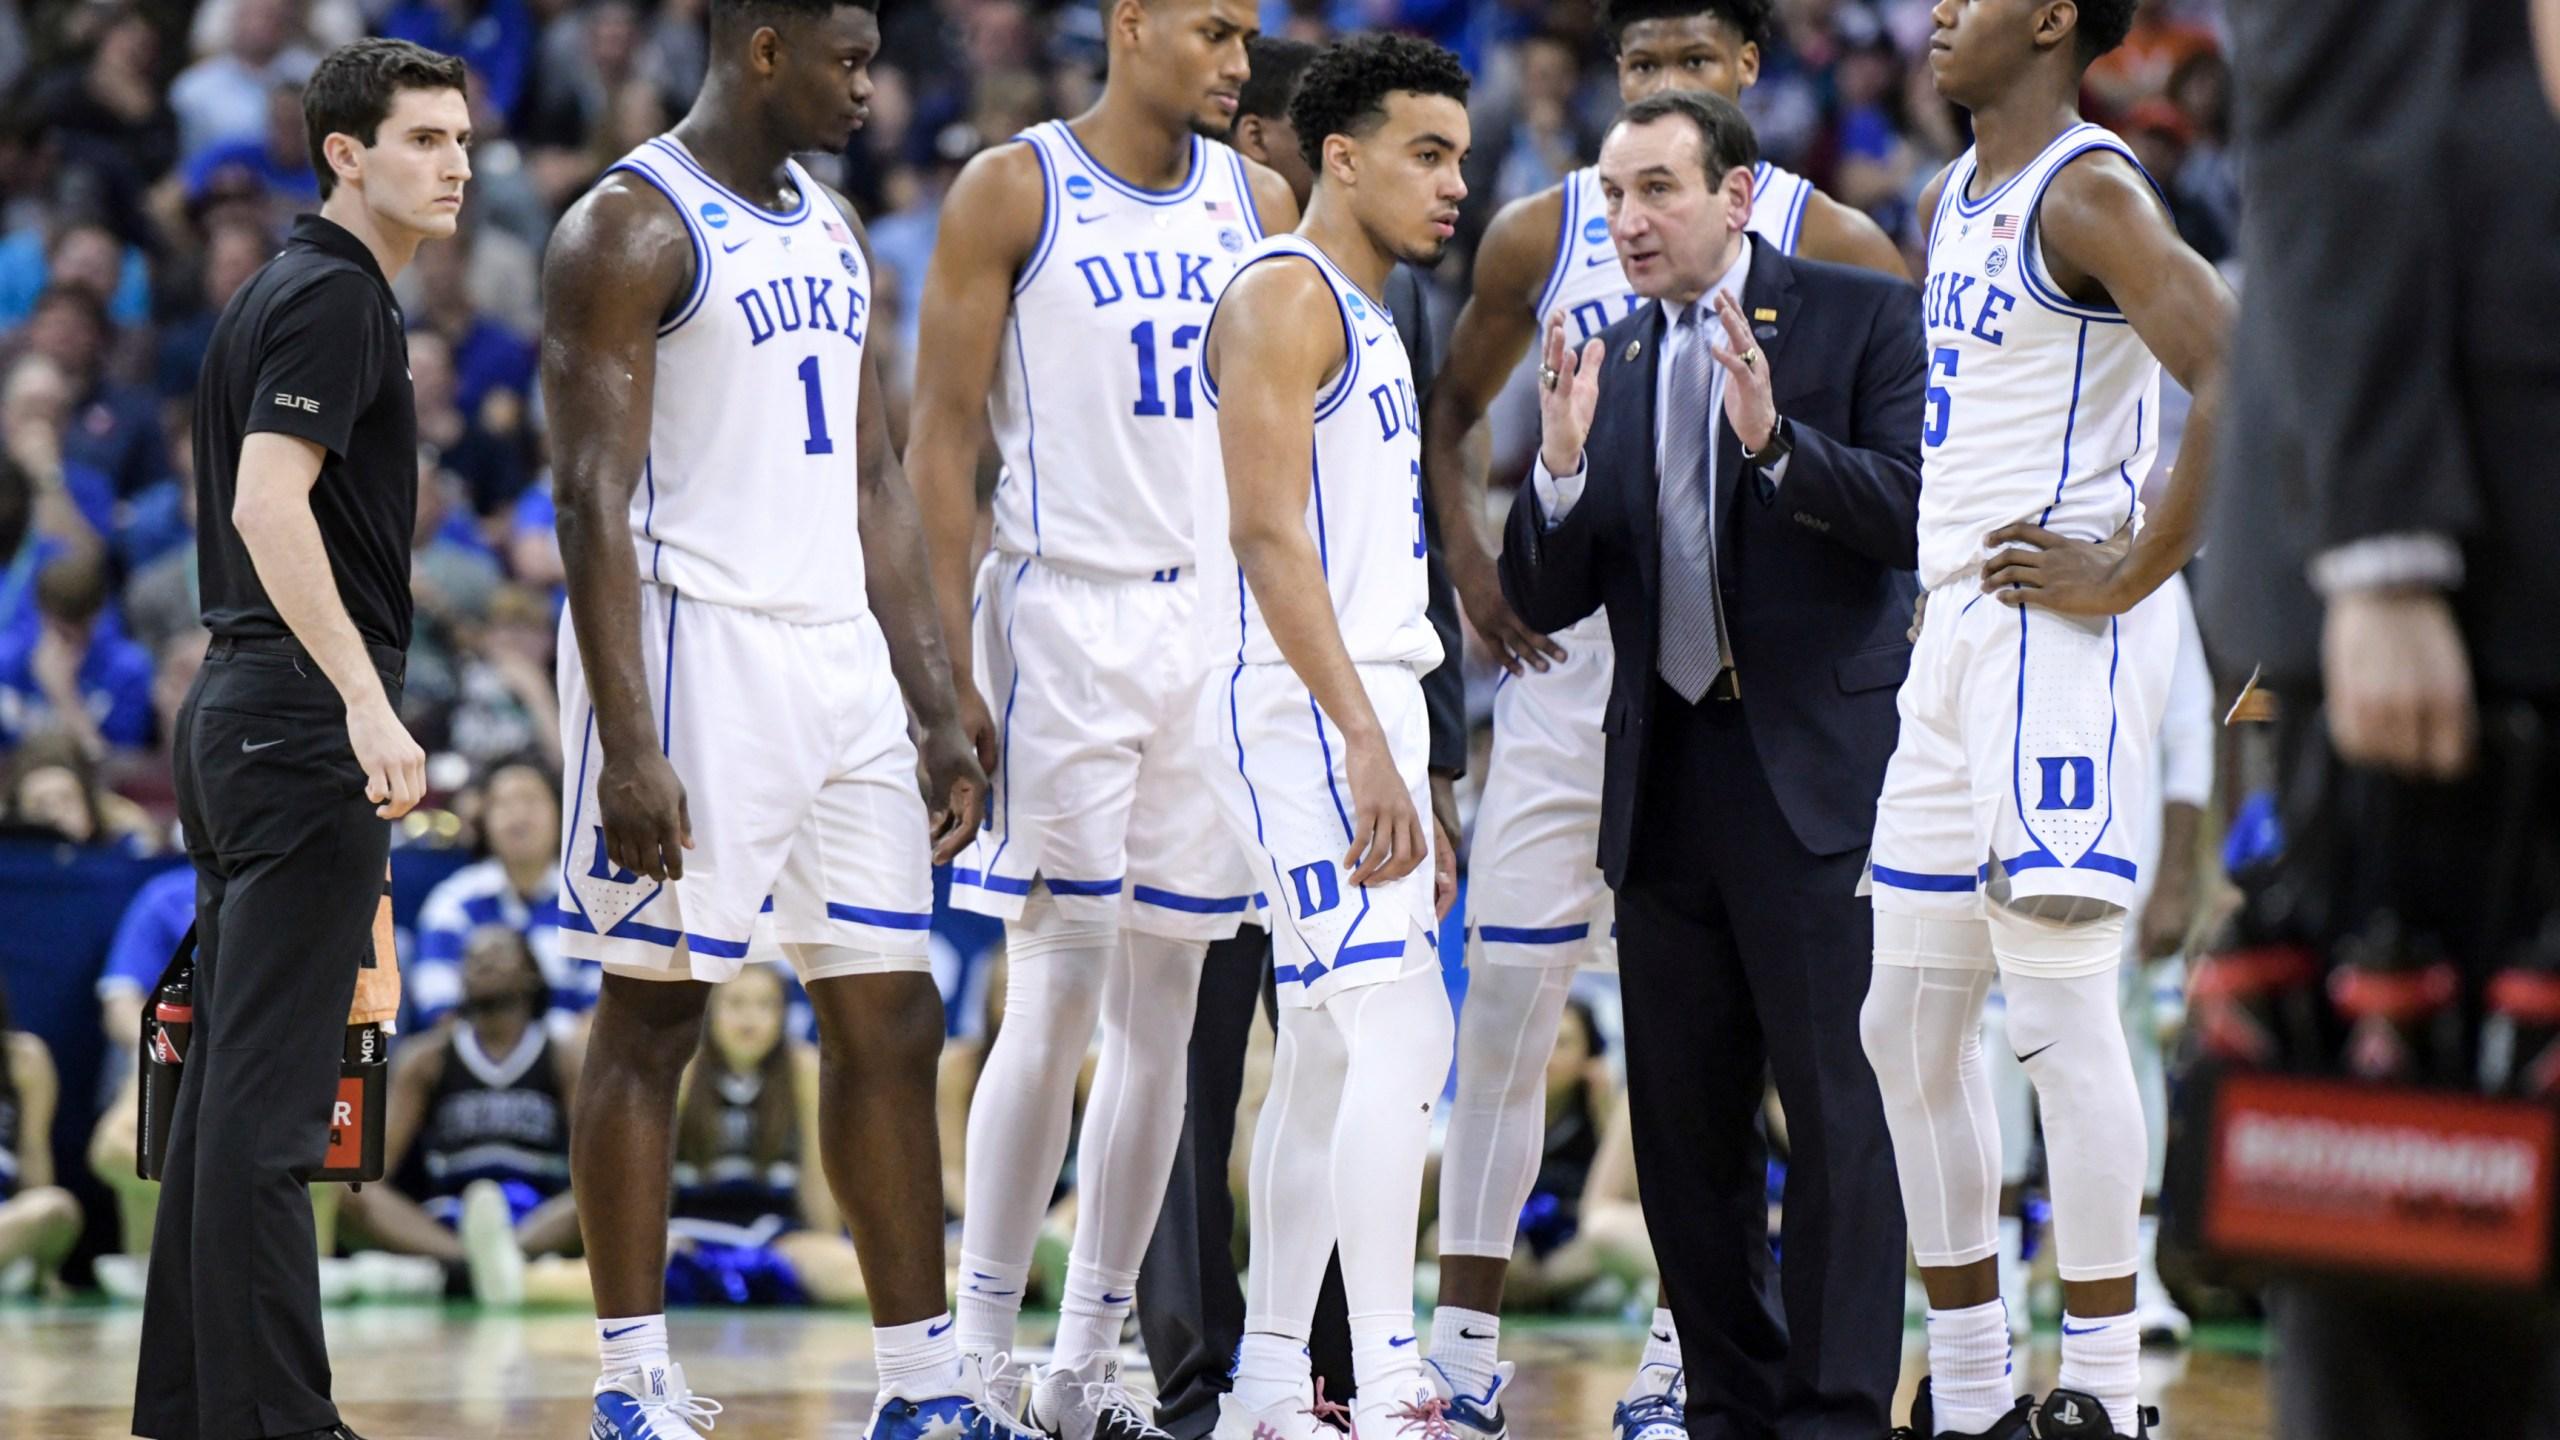 NCAA_UCF_Duke_Basketball_19048-159532-159532.jpg71288940